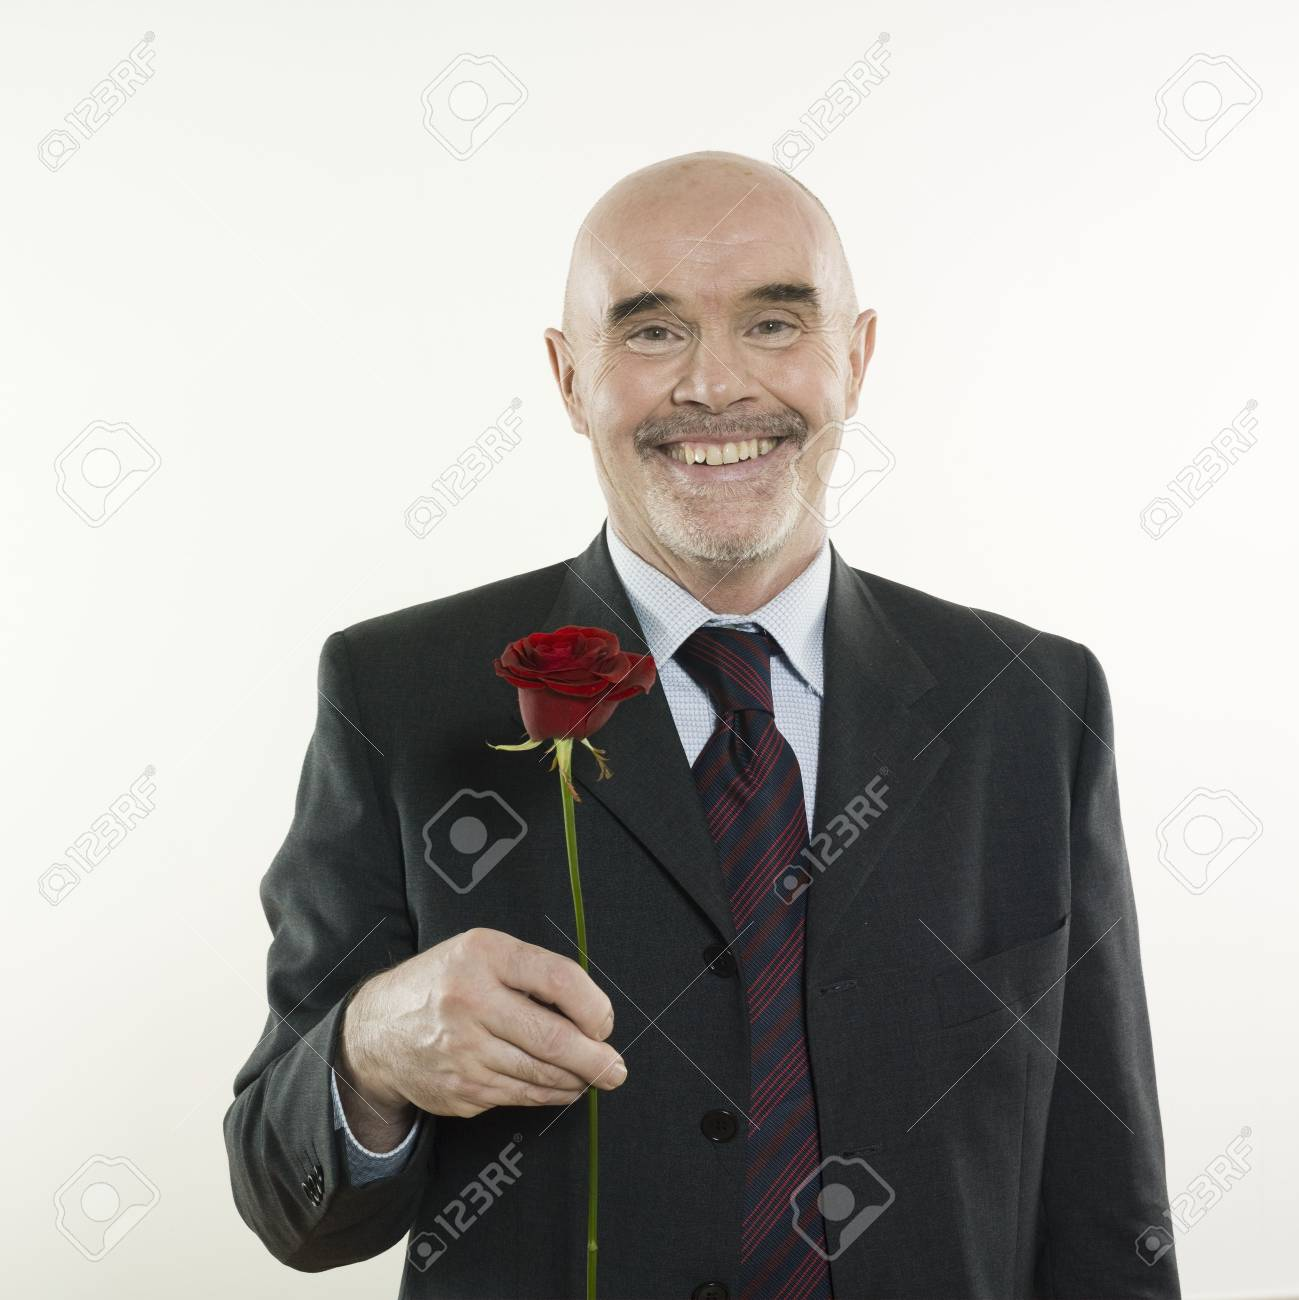 studio portrait isolated on white background of a man senior holding a rose flowe Stock Photo - 2966790